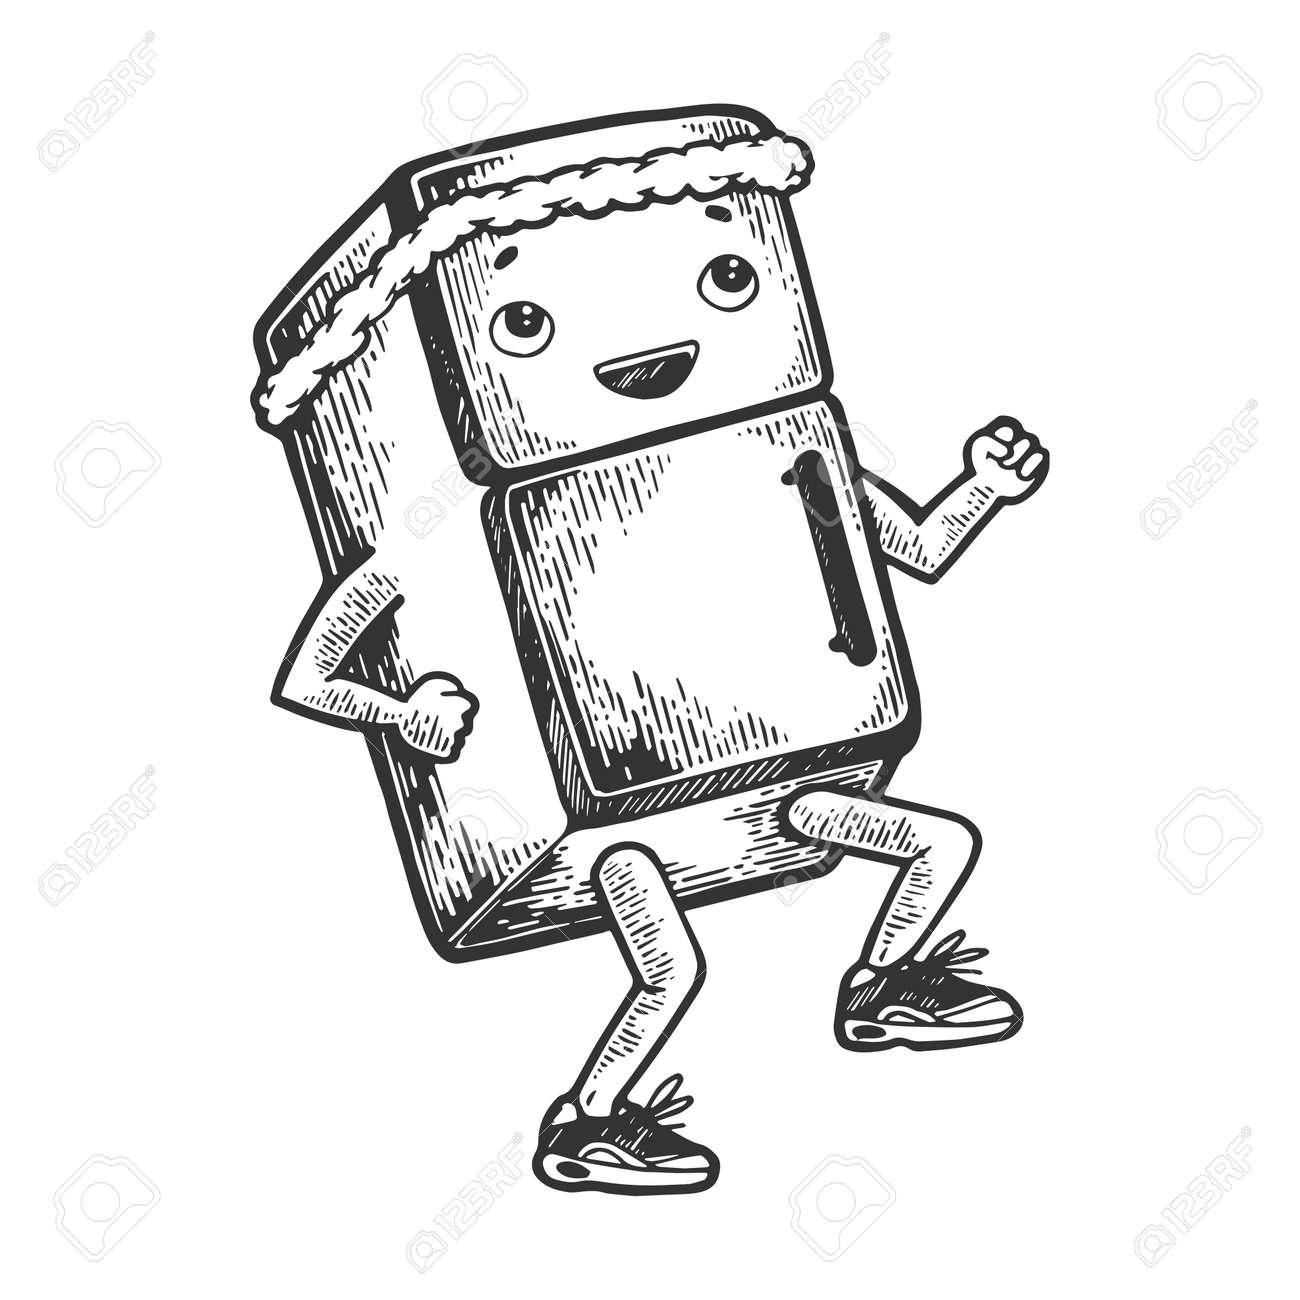 Fridge runner on its feet cartoon character sketch engraving